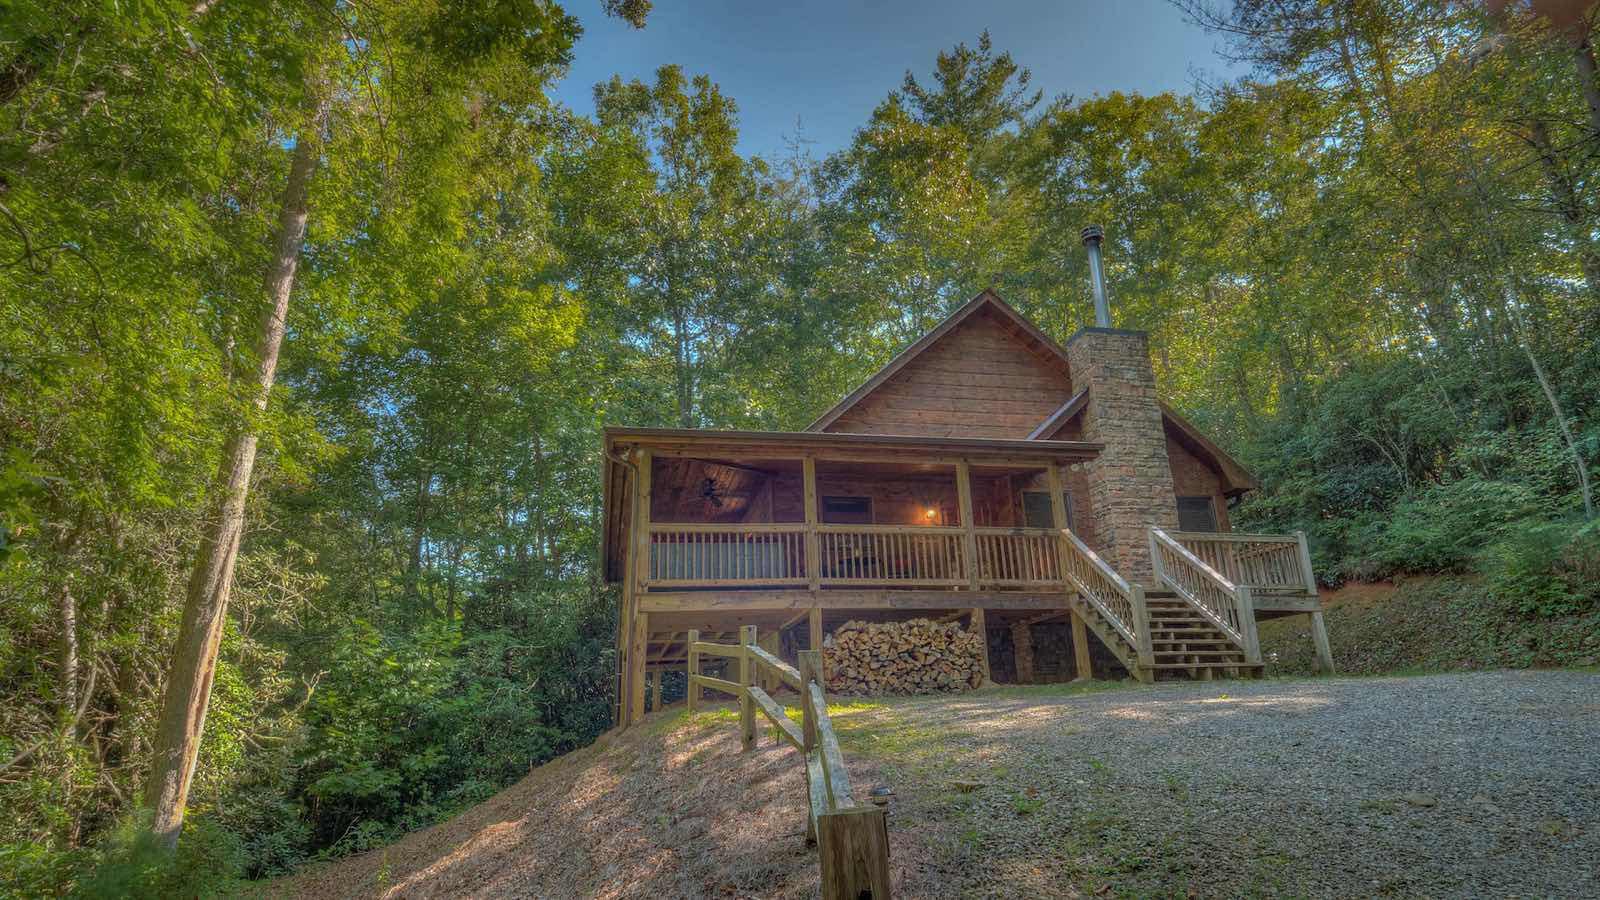 100 vacation cabin rentals near atlanta ga